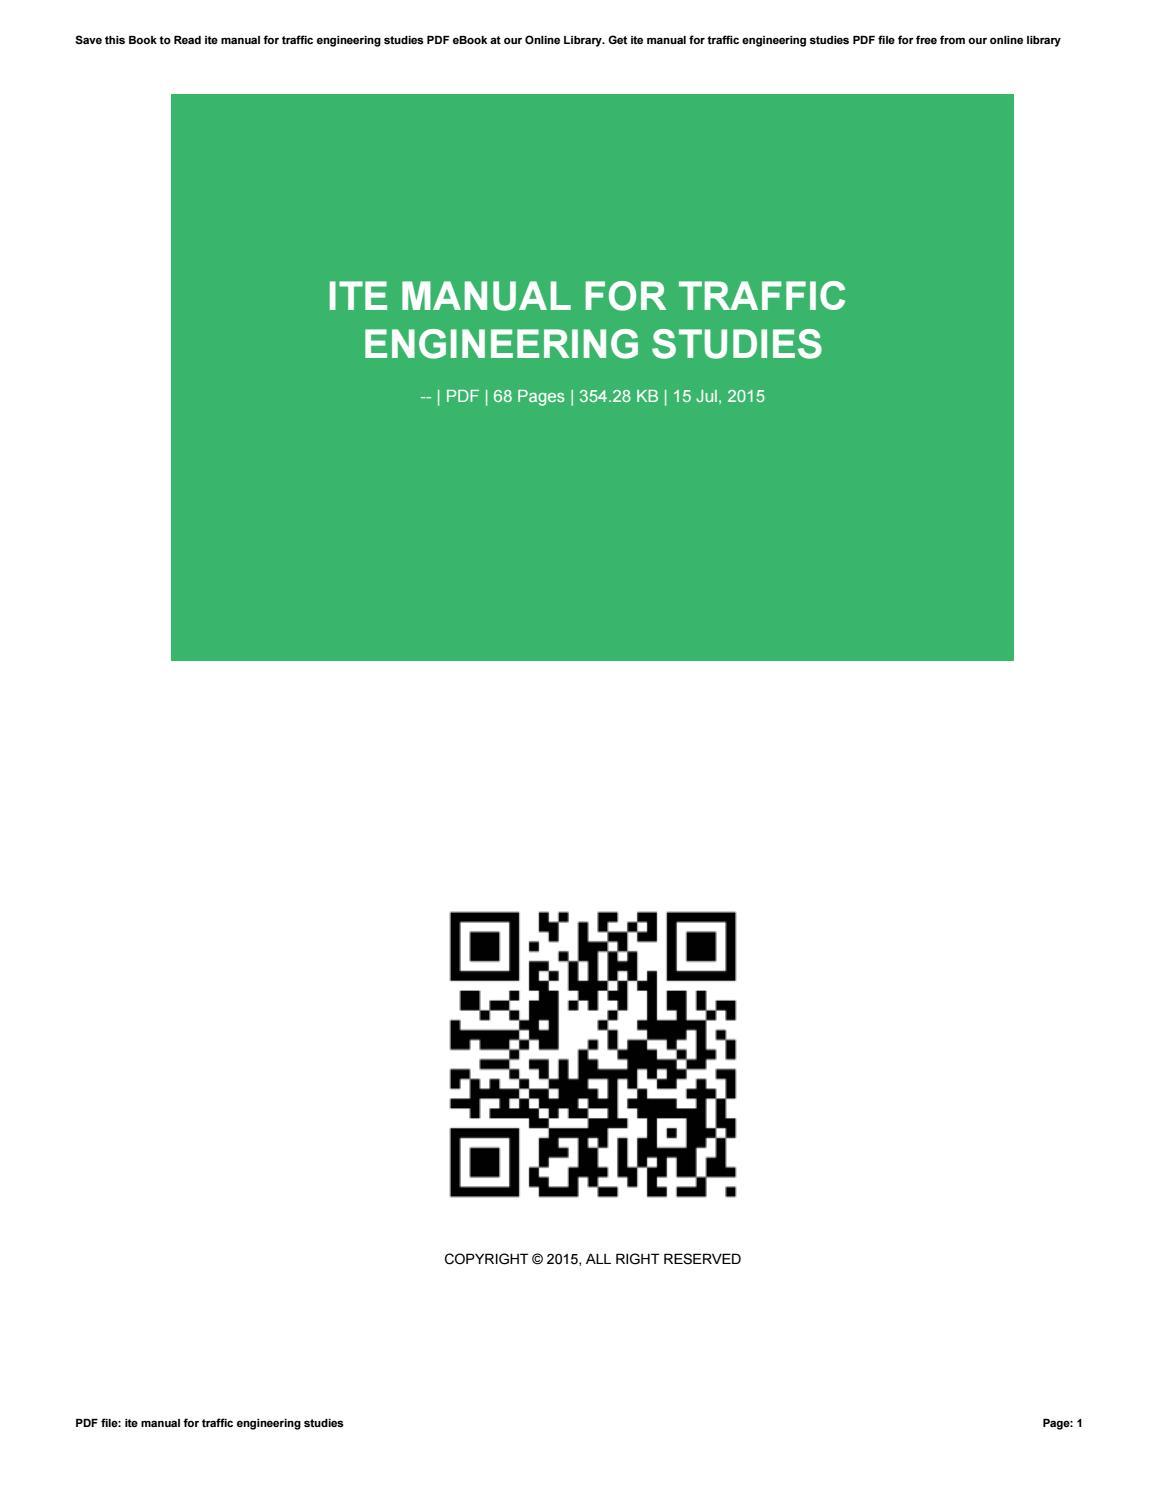 Ite manual for traffic engineering studies by JustinHendricks2784 - issuu